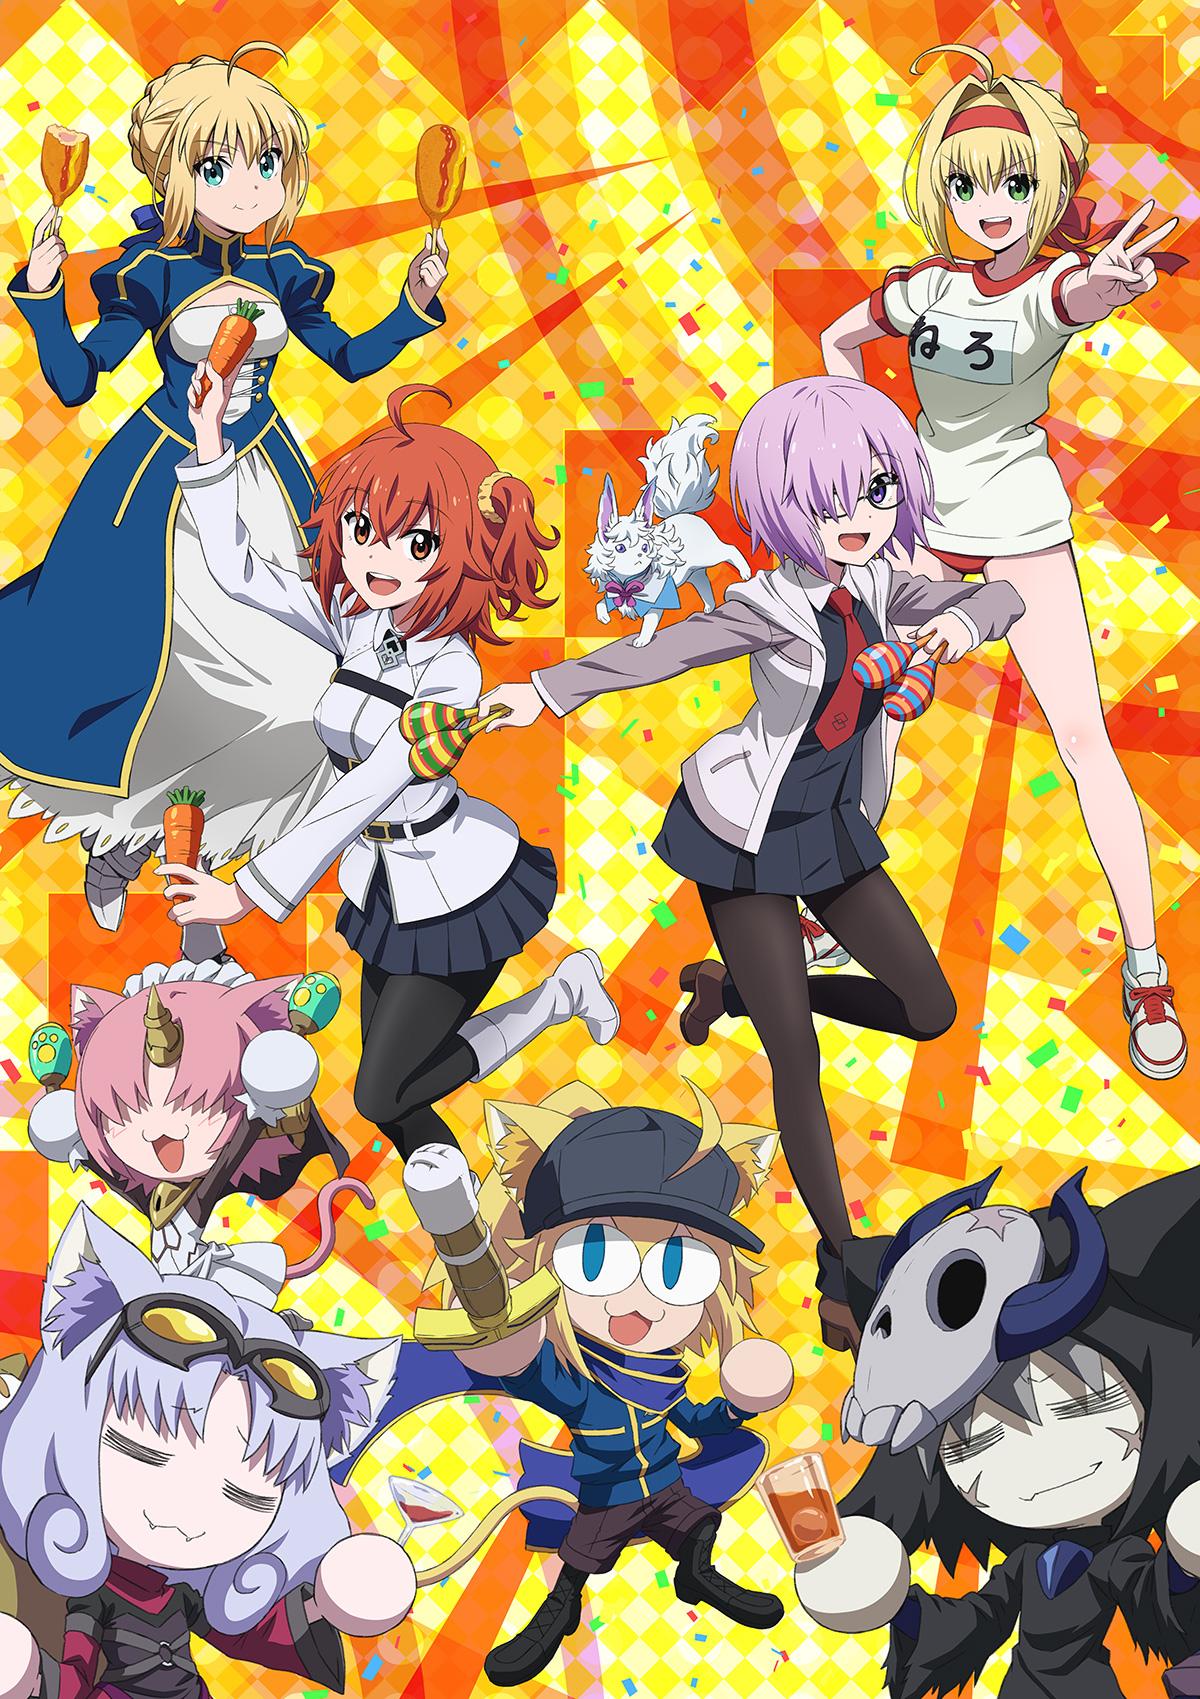 "OVA「Fate/Grand Carnival」アルトリア&ネロが新登場し""お祭り騒ぎ""が盛り上がっていく最新ビジュアル解禁!店舗購入特典情報も更新"